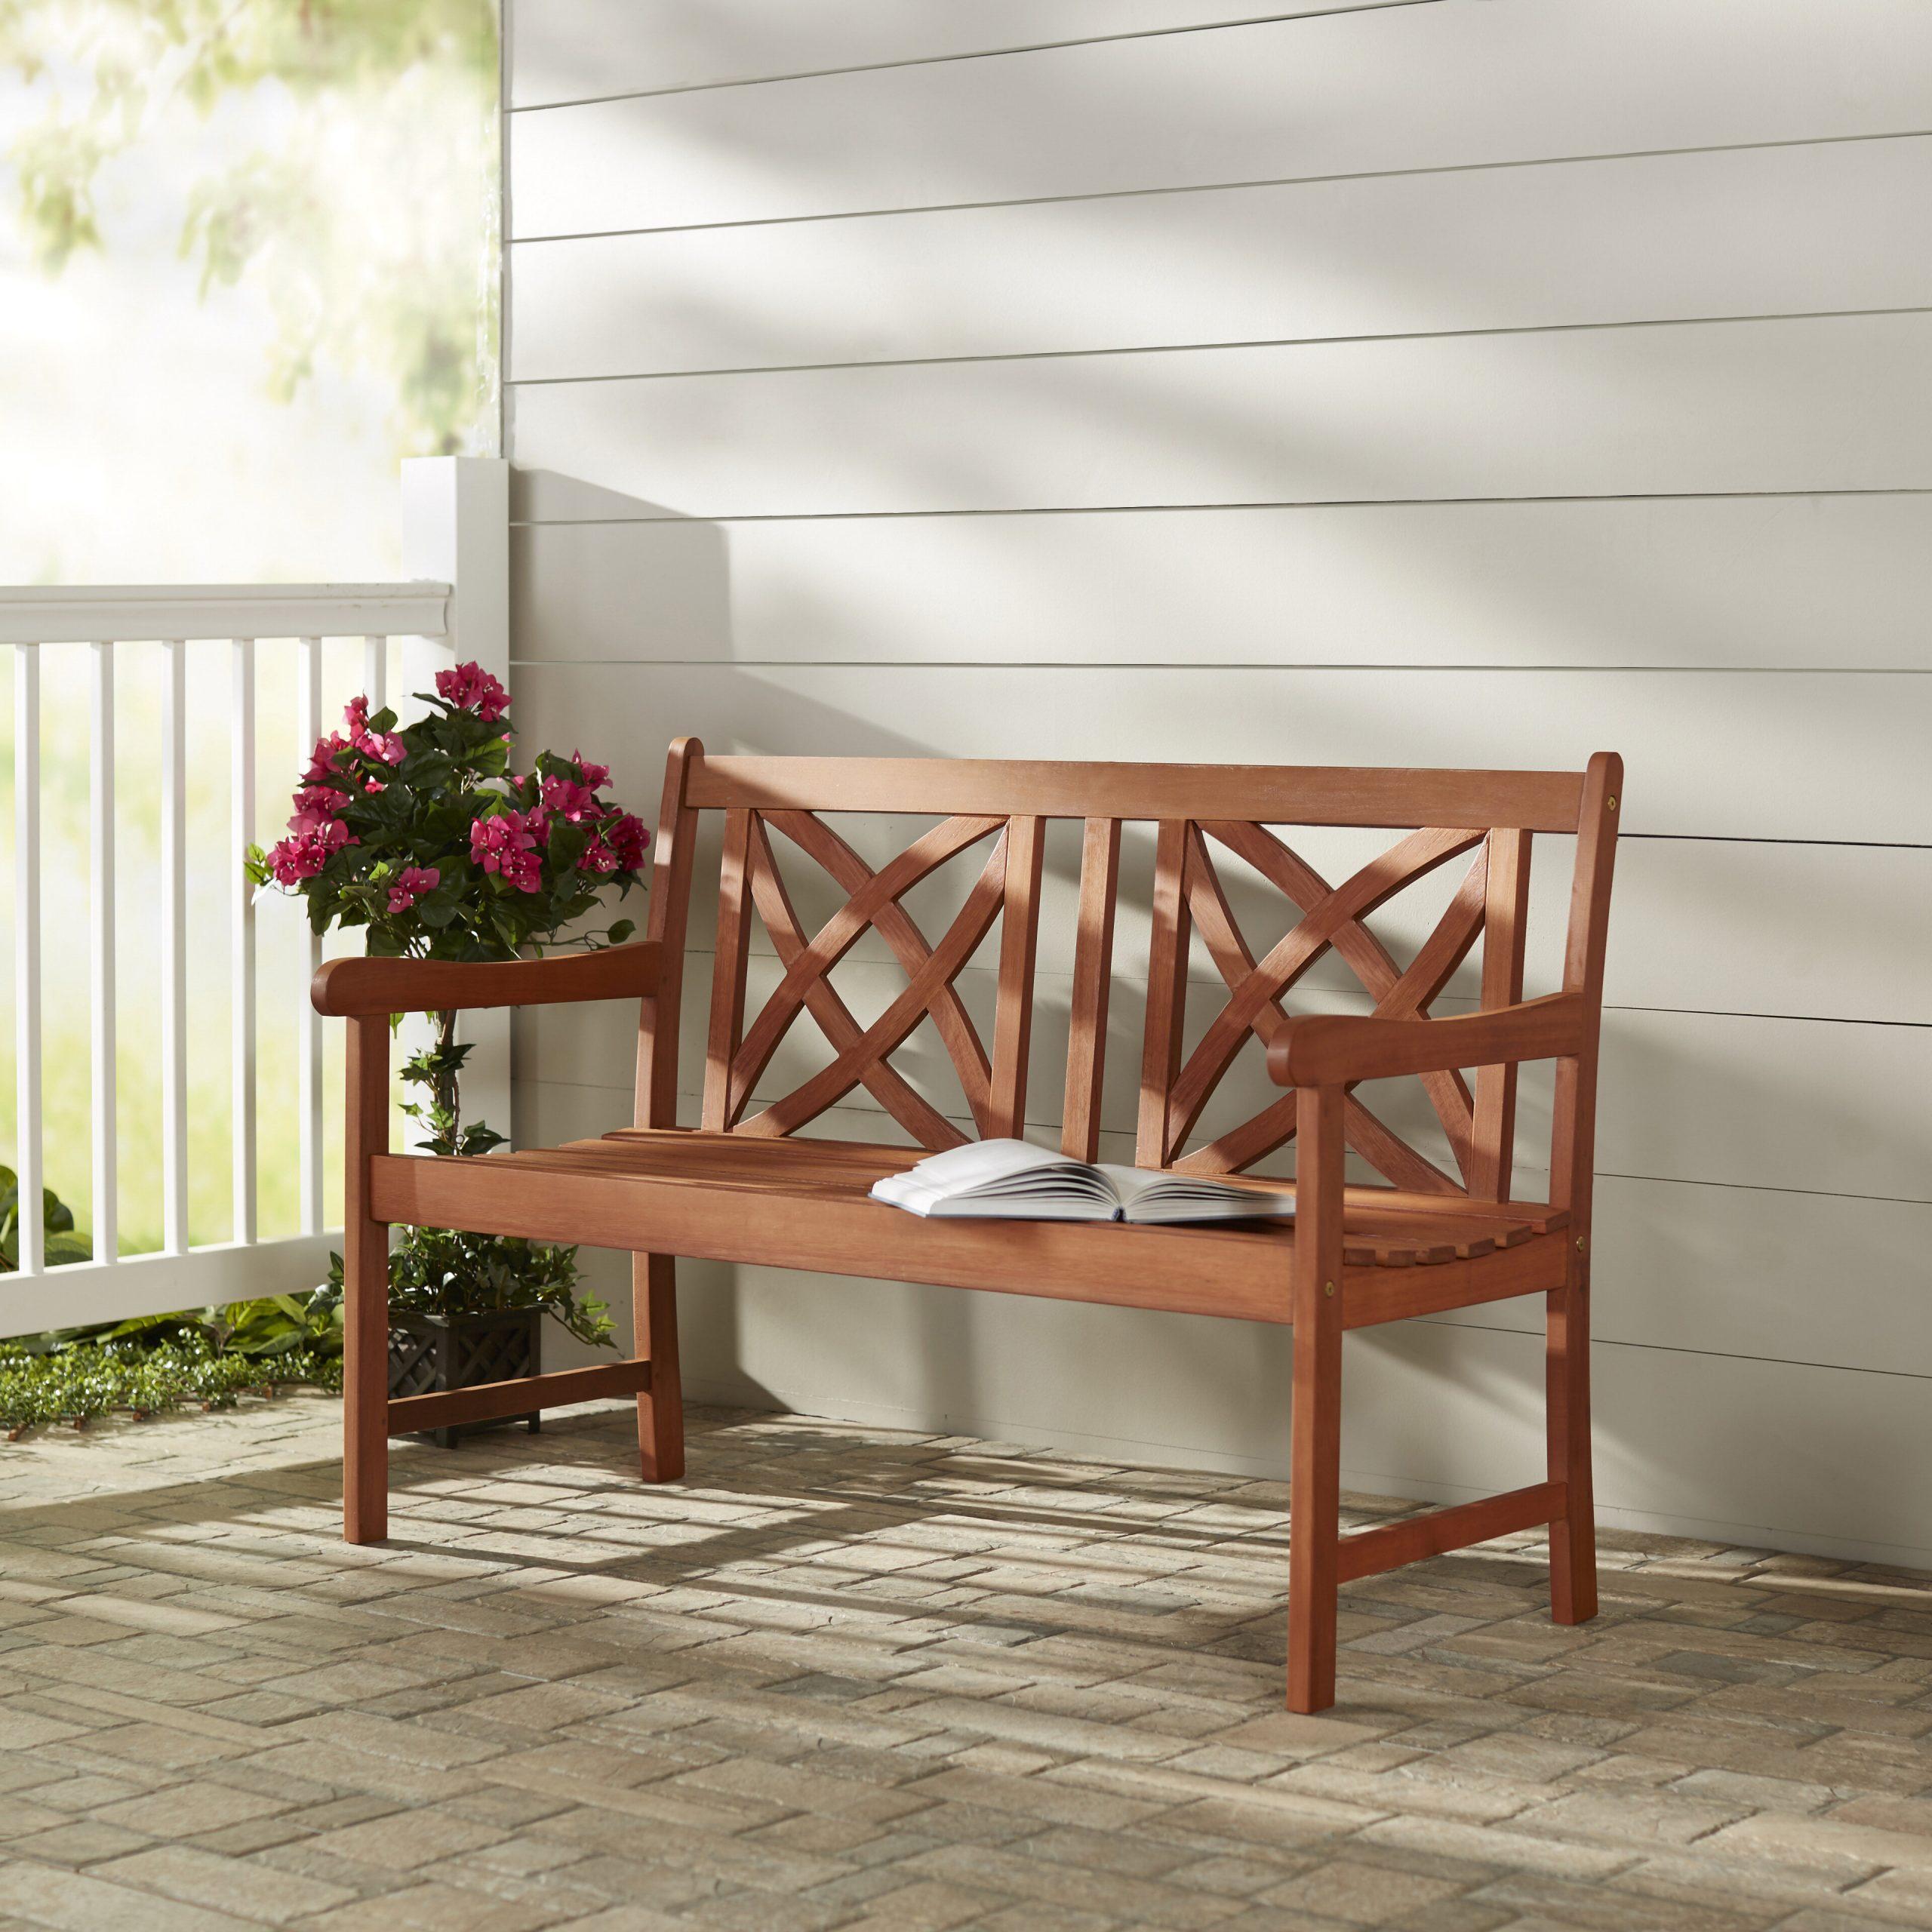 Maliyah Solid Wood Garden Bench Regarding Avoca Wood Garden Benches (View 7 of 25)